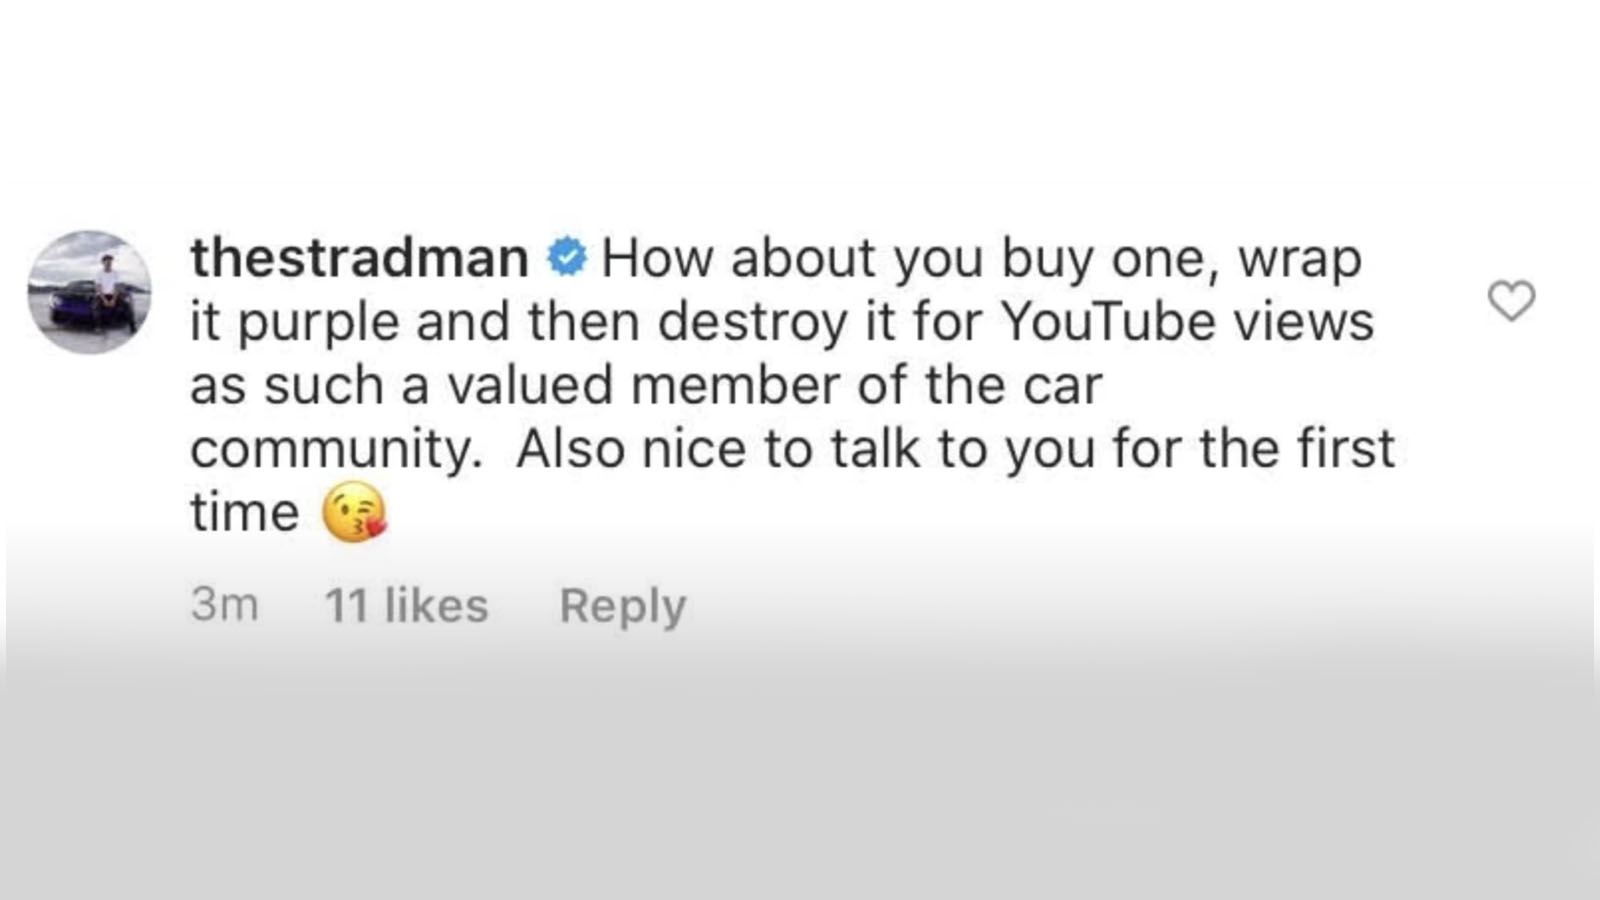 stradman IG comment